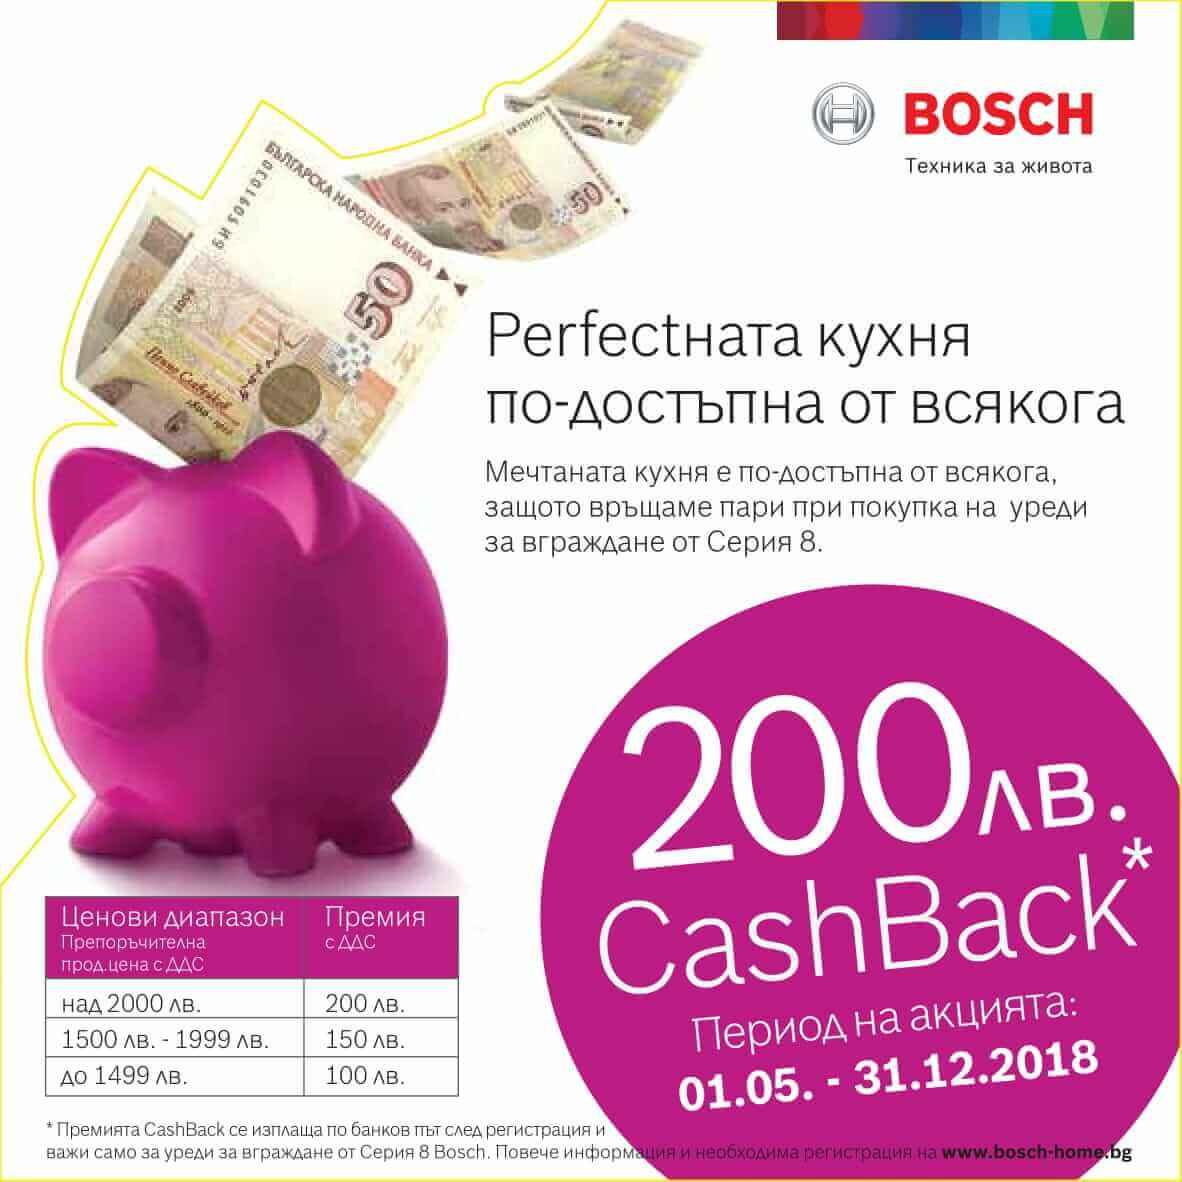 BOSCH CashBack